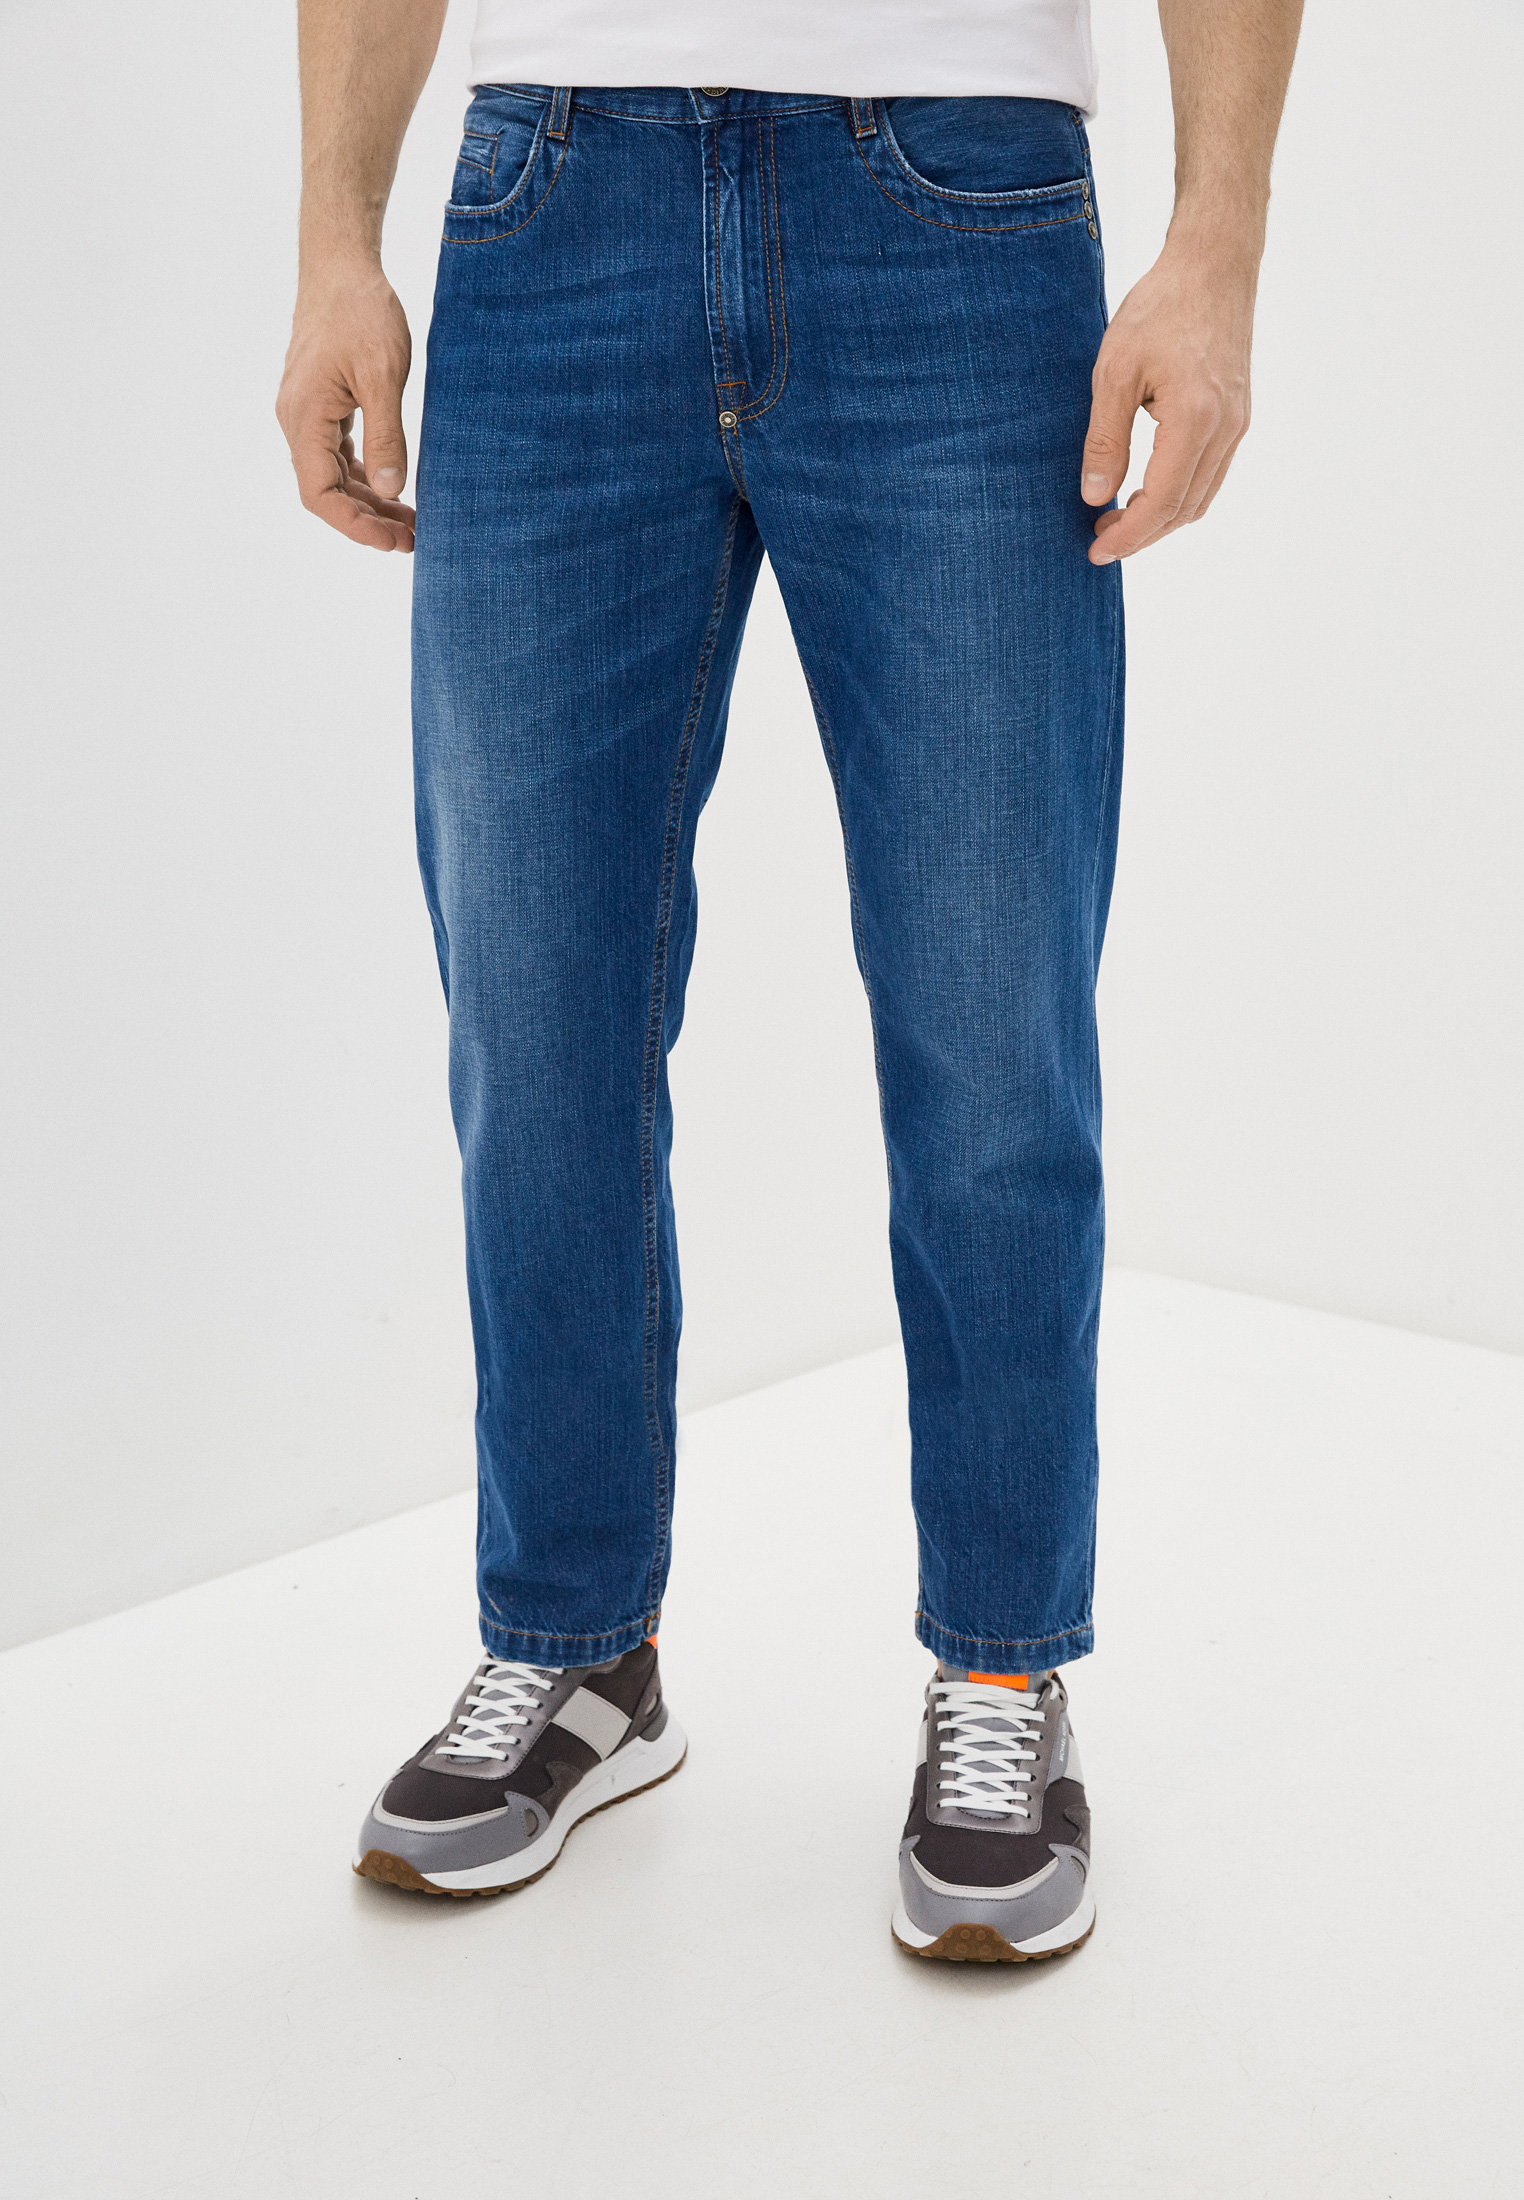 Мужские прямые джинсы Bikkembergs (Биккембергс) c q 102 03 t 9974